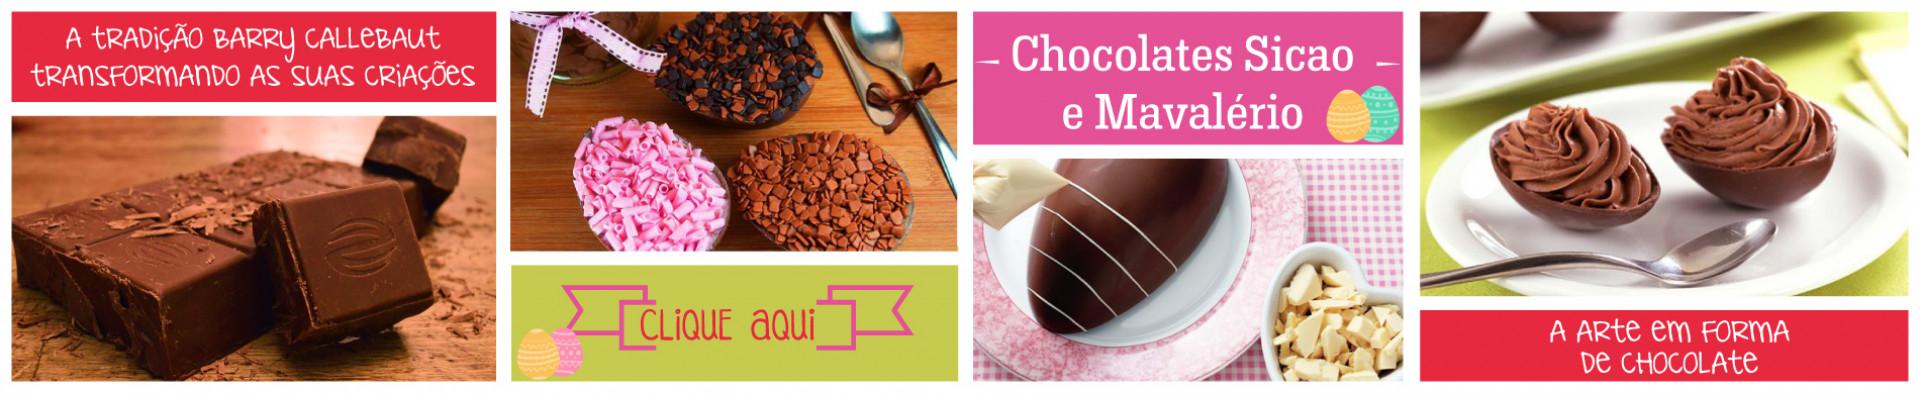 Chocolates Páscoa